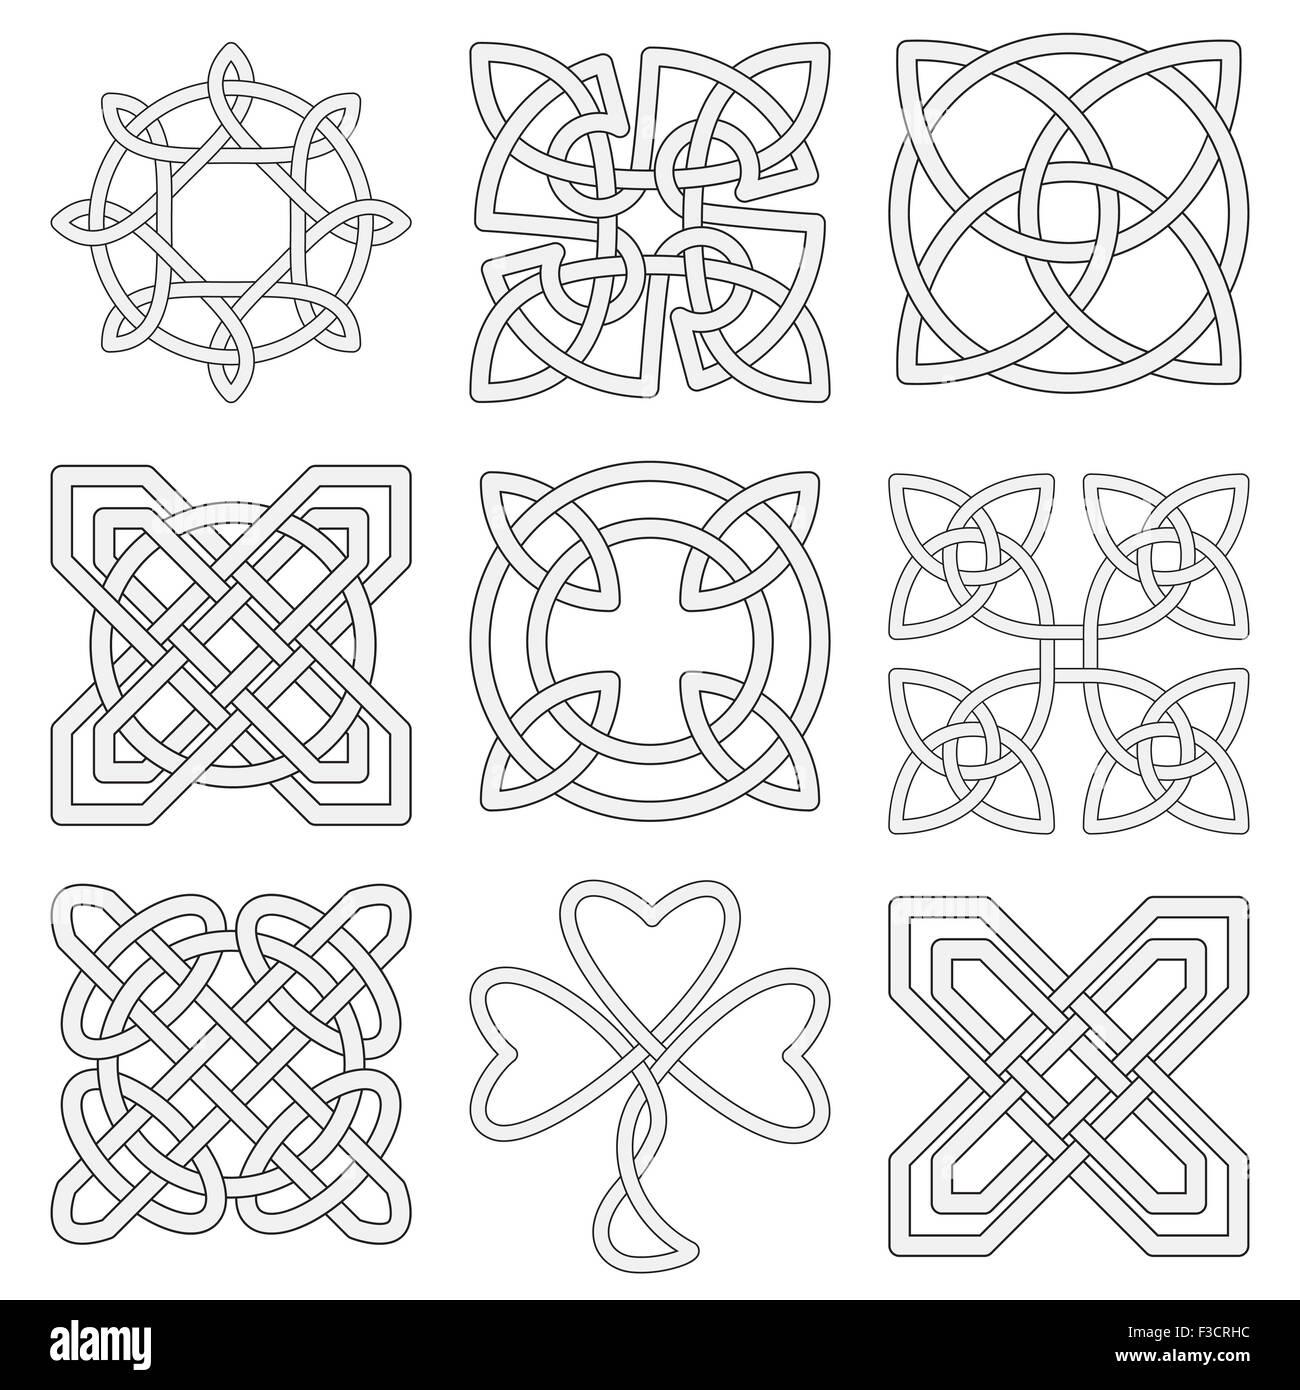 Knots Illustration Imágenes De Stock & Knots Illustration Fotos De ...